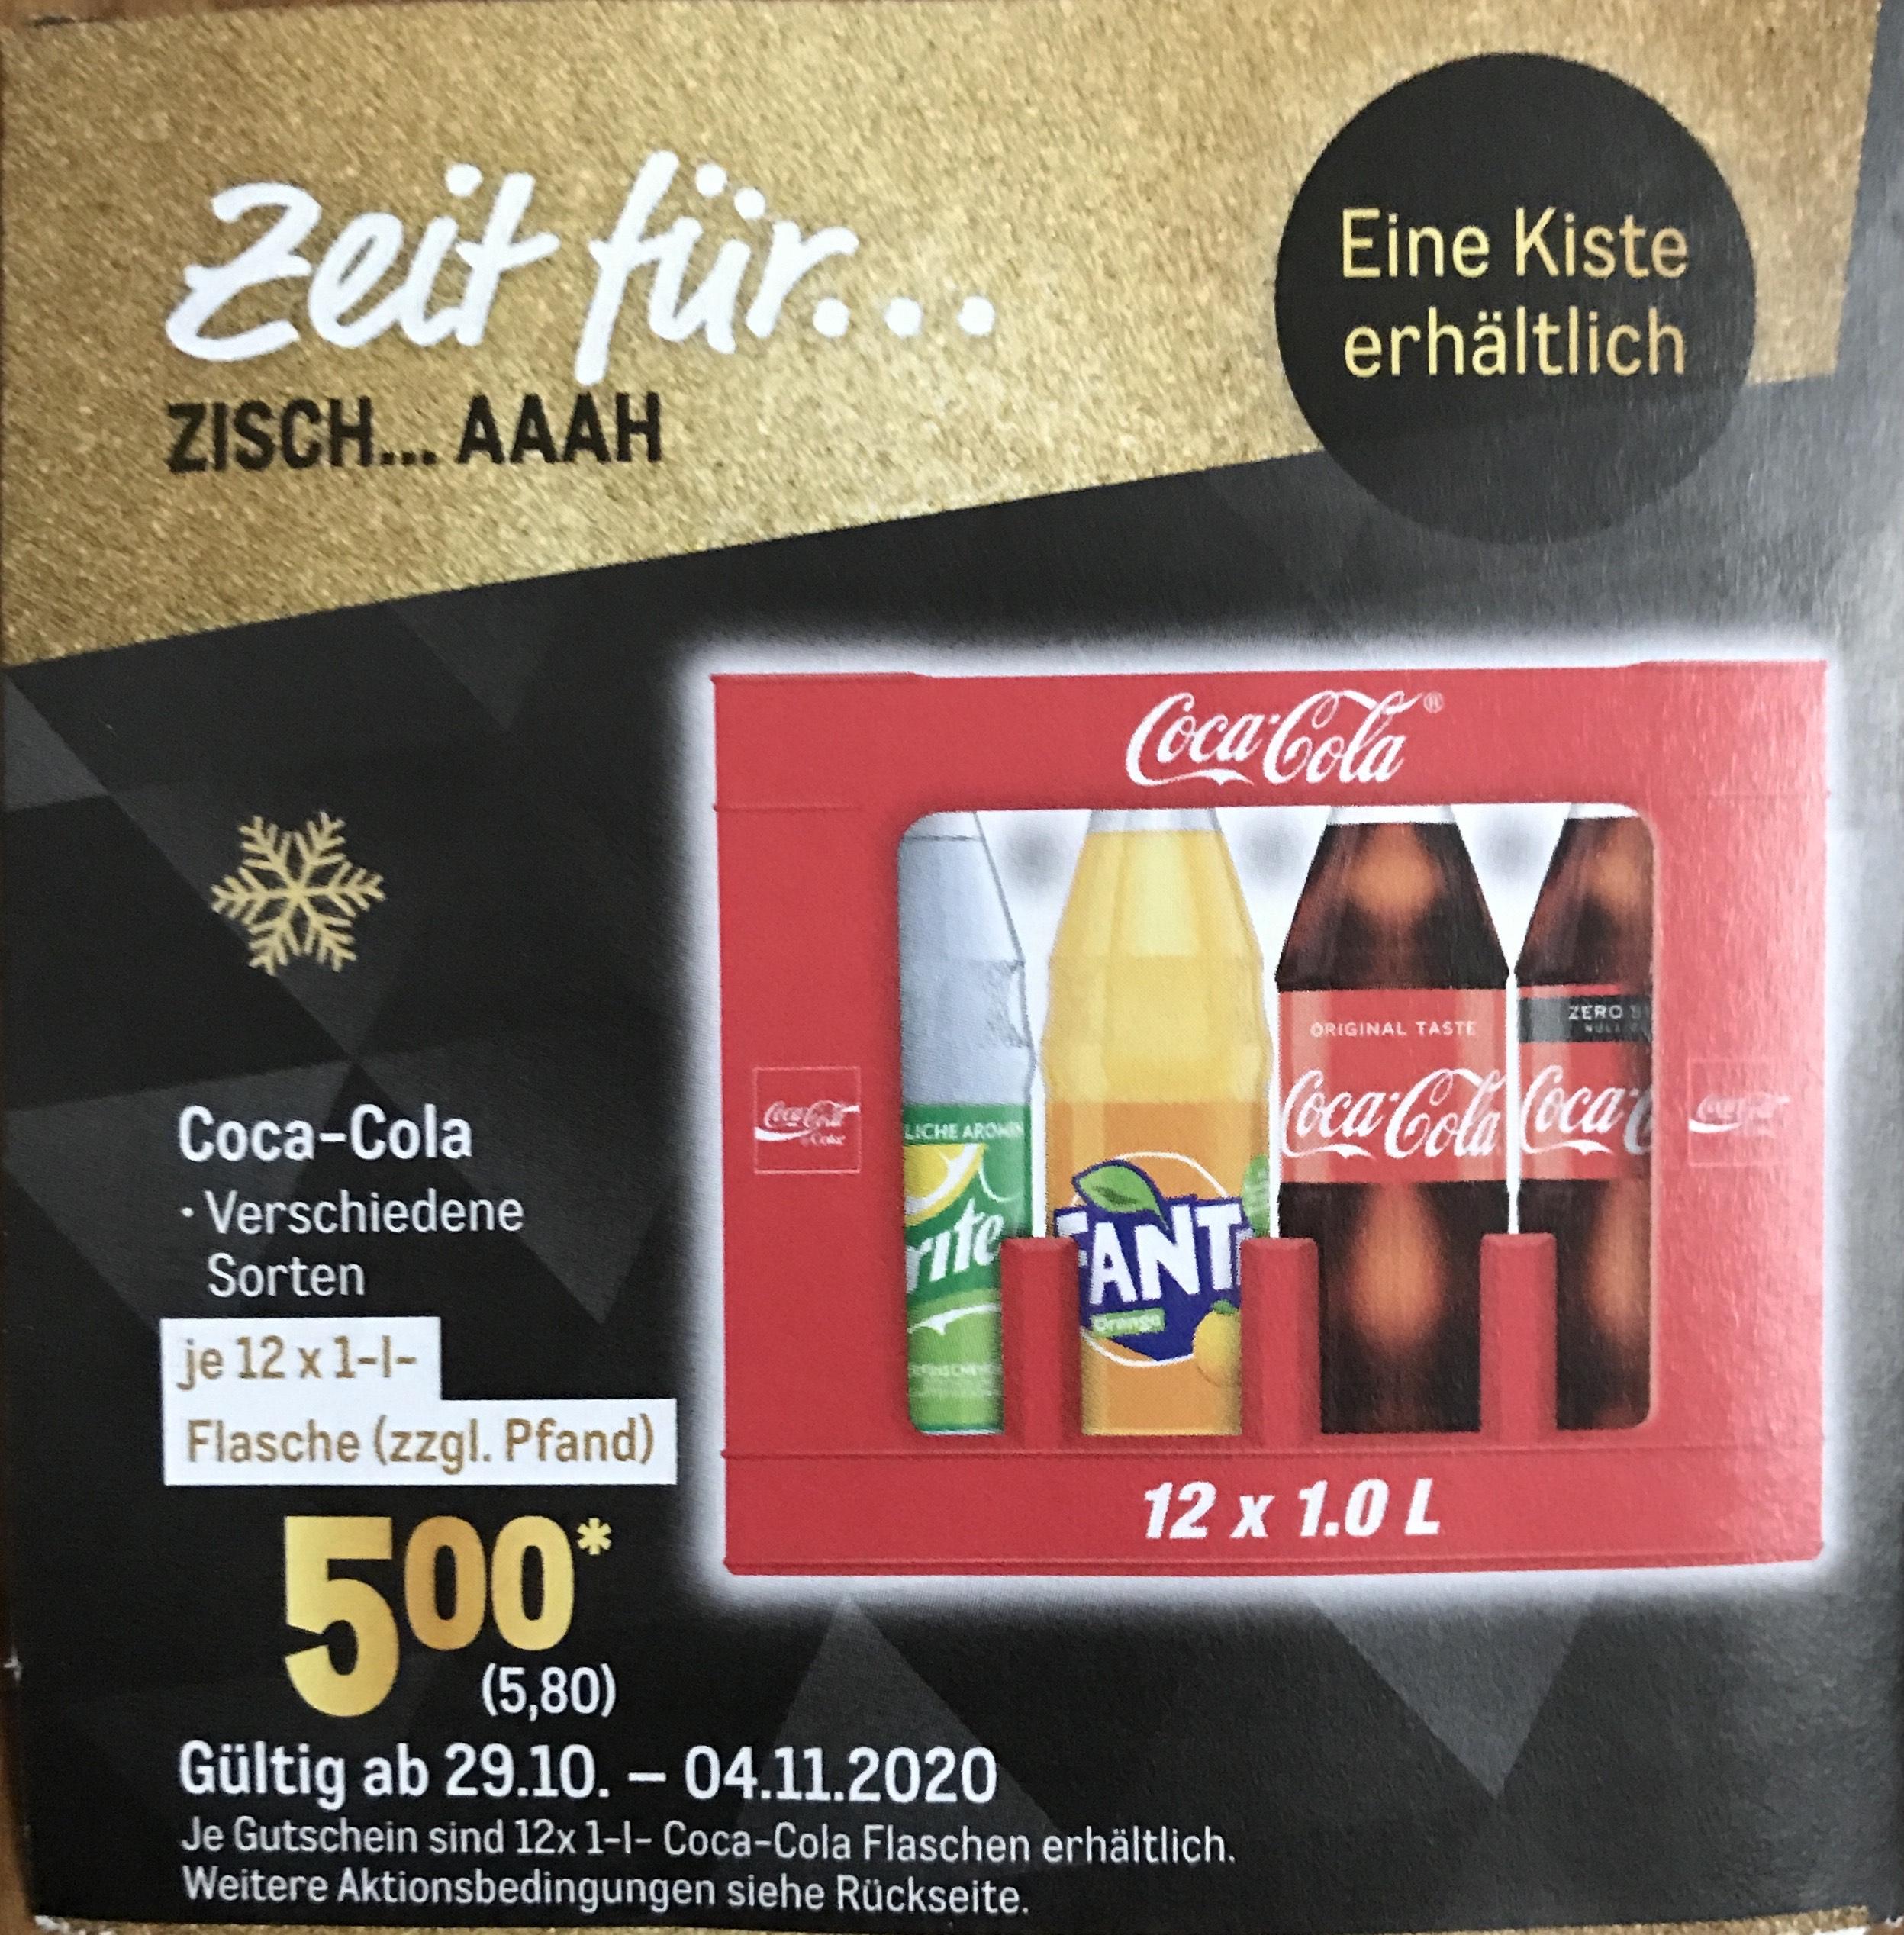 [Metro] Coca-Cola 12x1l mit Coupon für 5,80€ ab 29.10.20 (0,48€ je Liter)